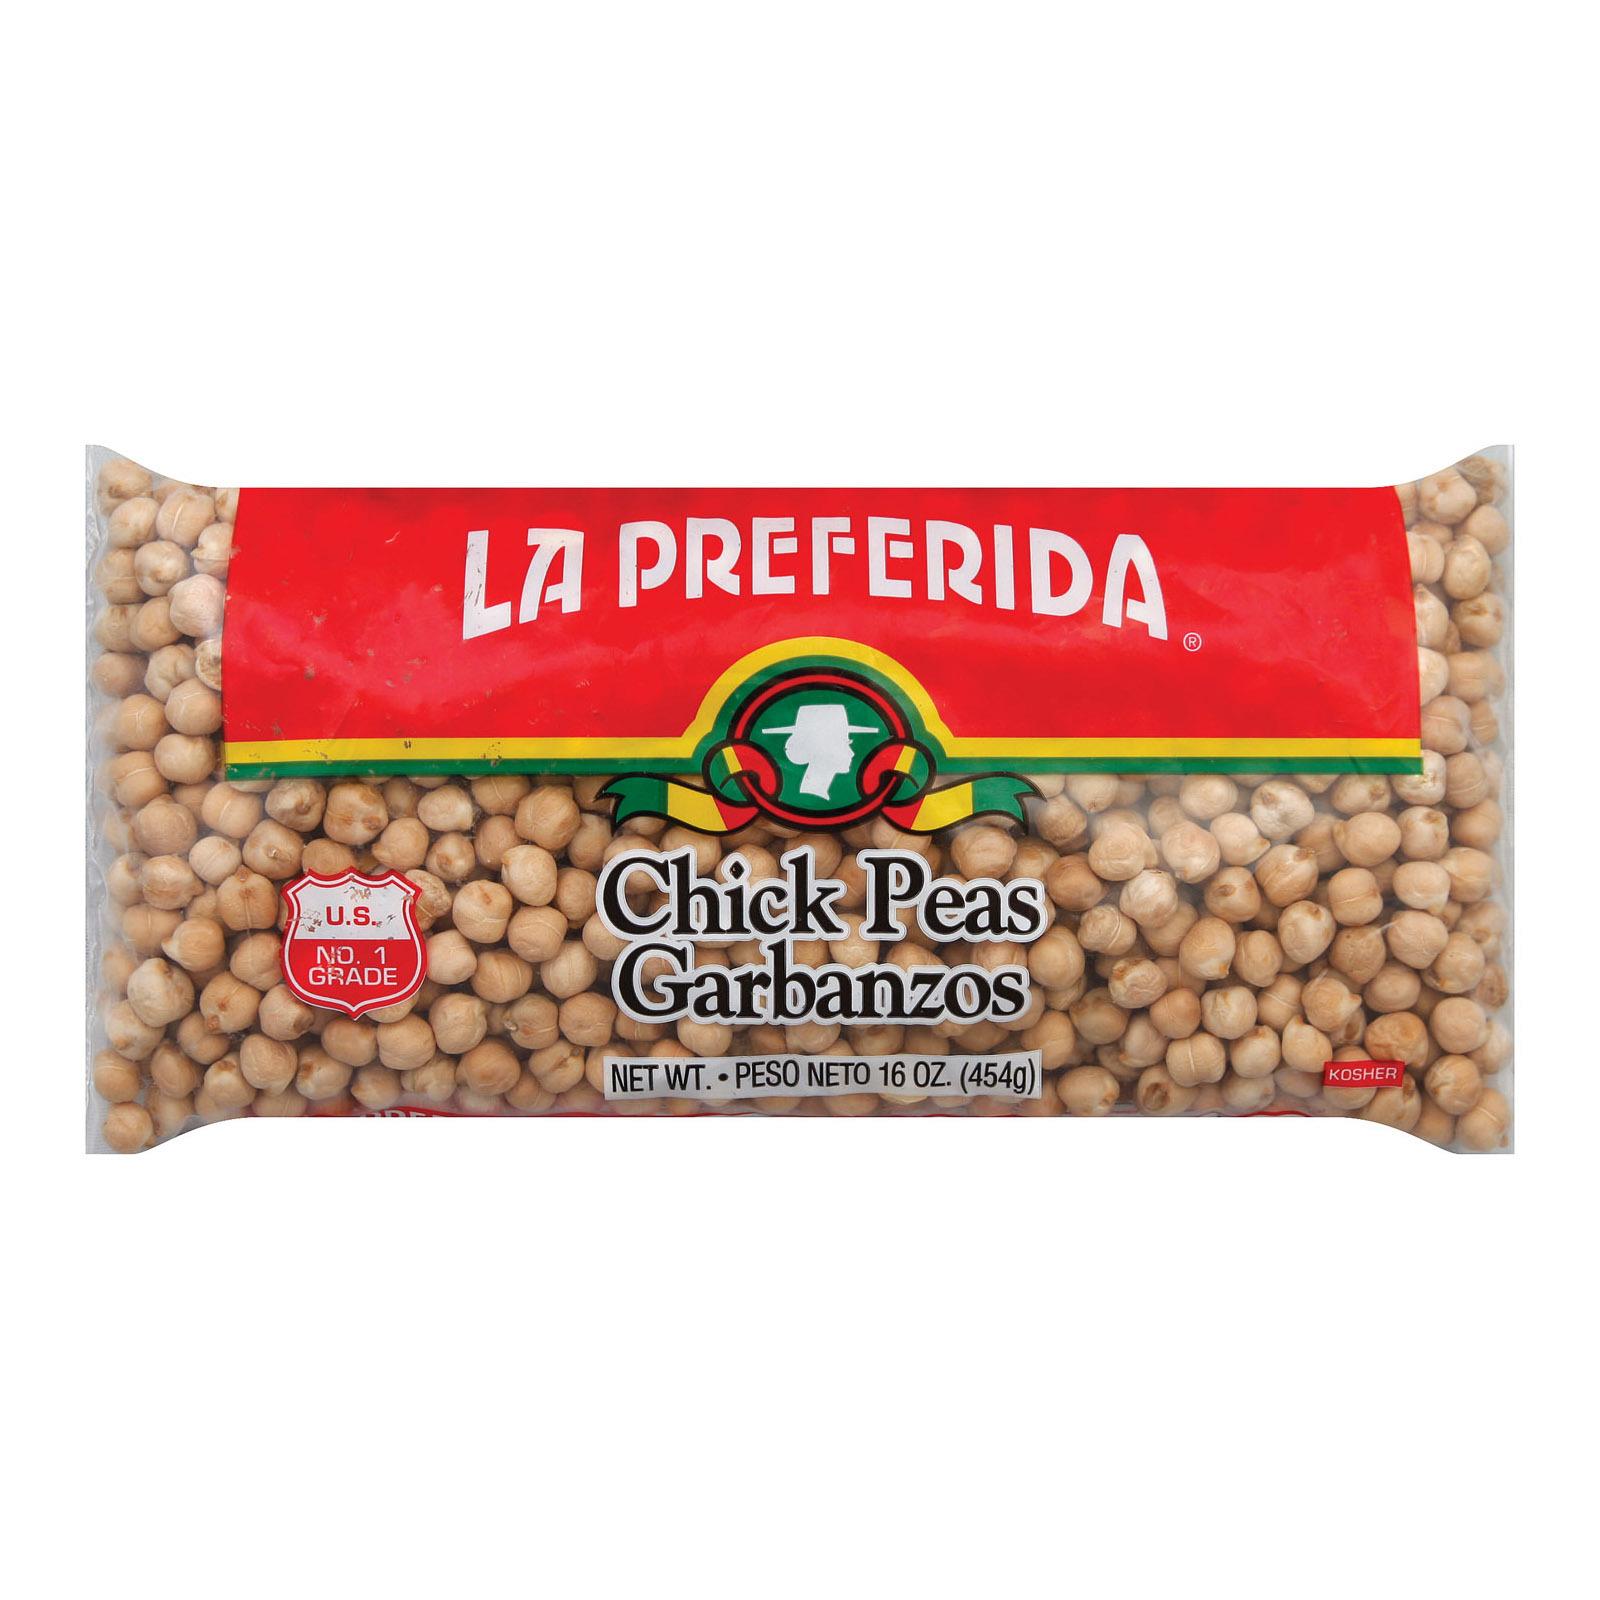 La Preferida Chick Peas - Case of 24 - 16 oz